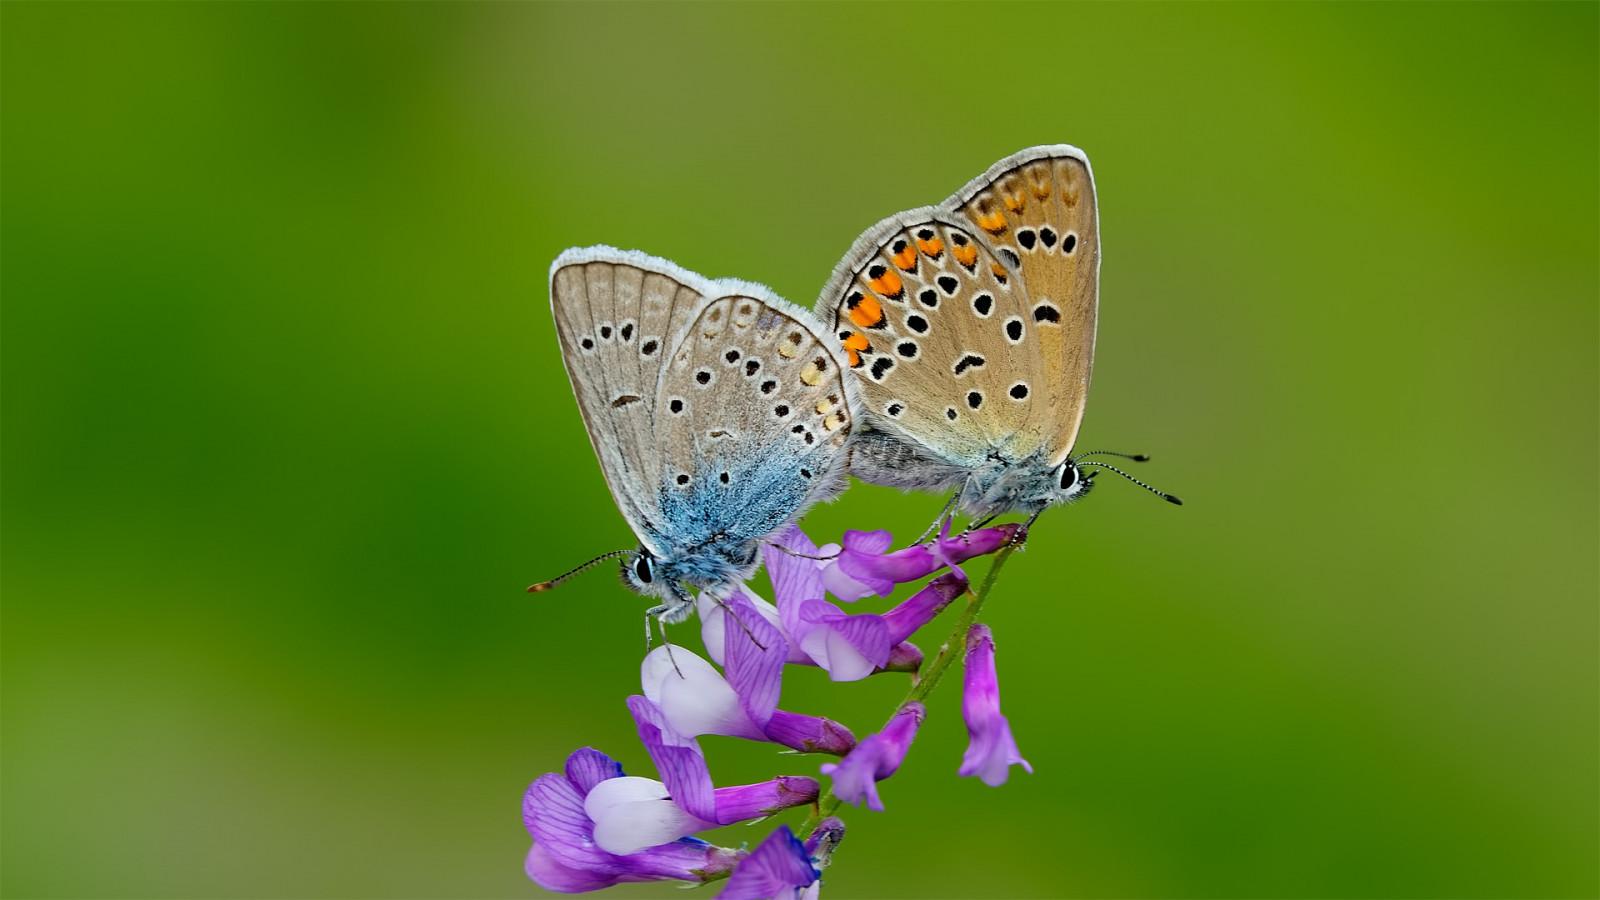 Hintergrundbilder : Natur, Minimalismus, Makro, Insekt, Grün, Muster ...